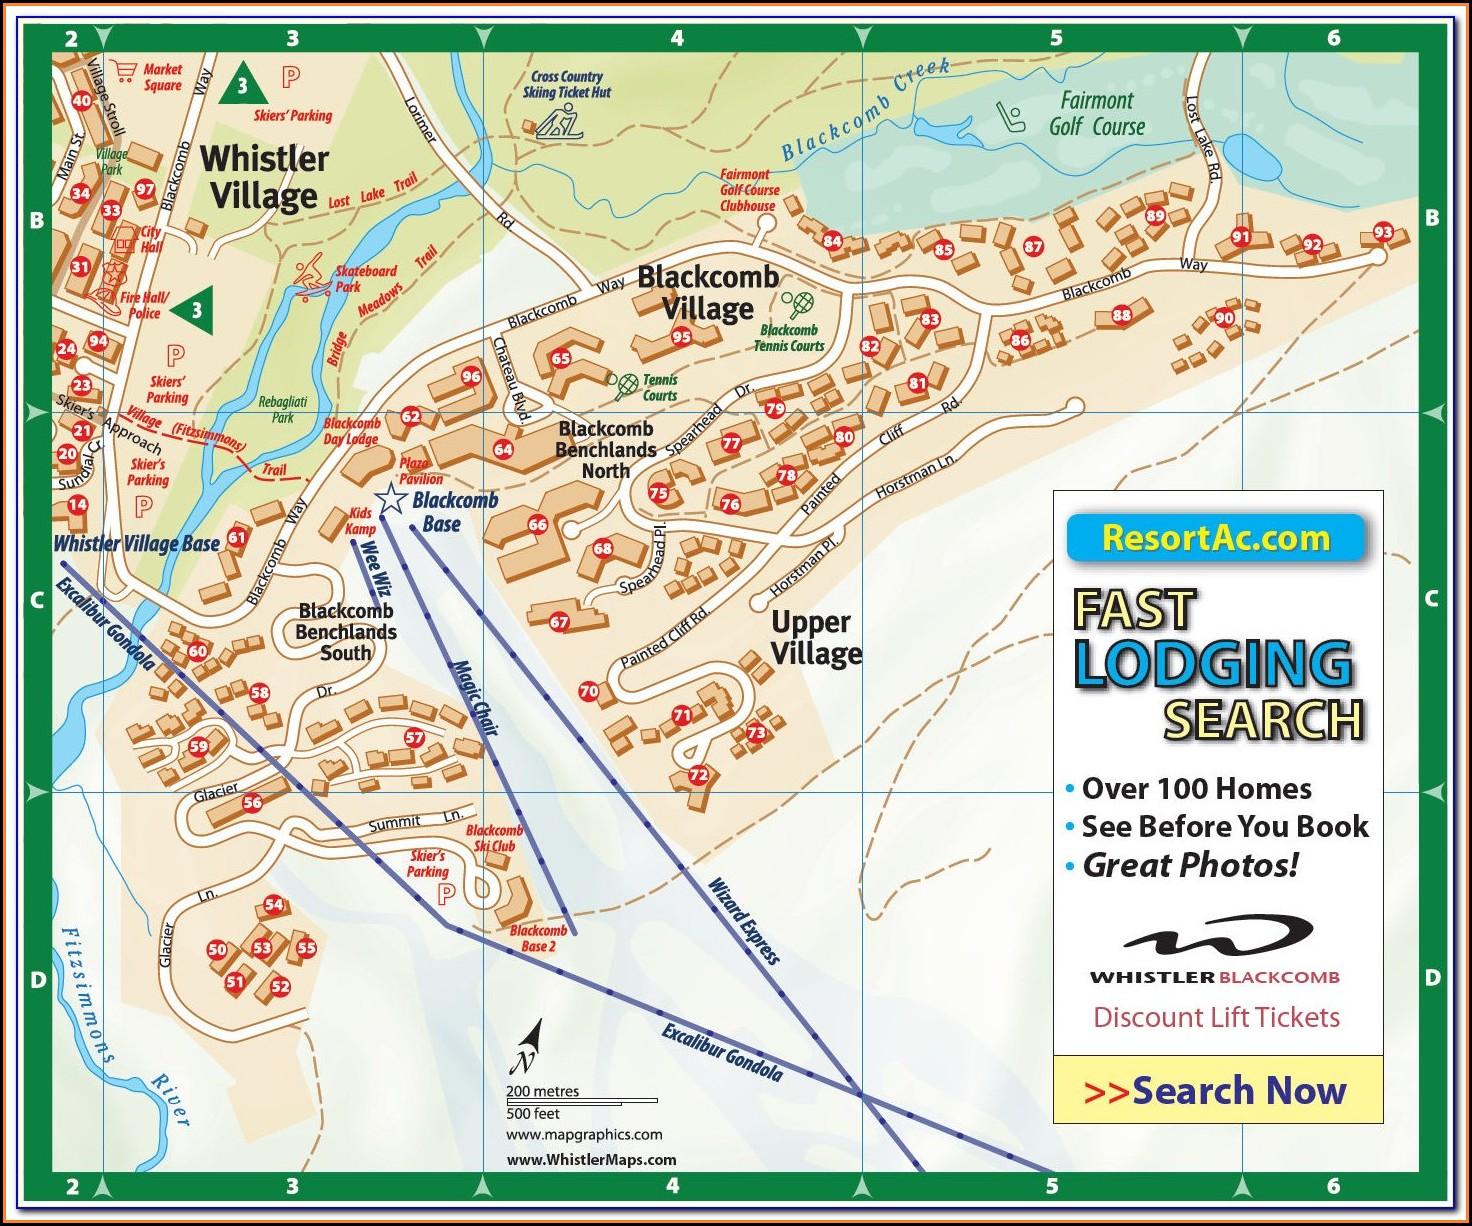 Whistler Blackcomb Lodging Map